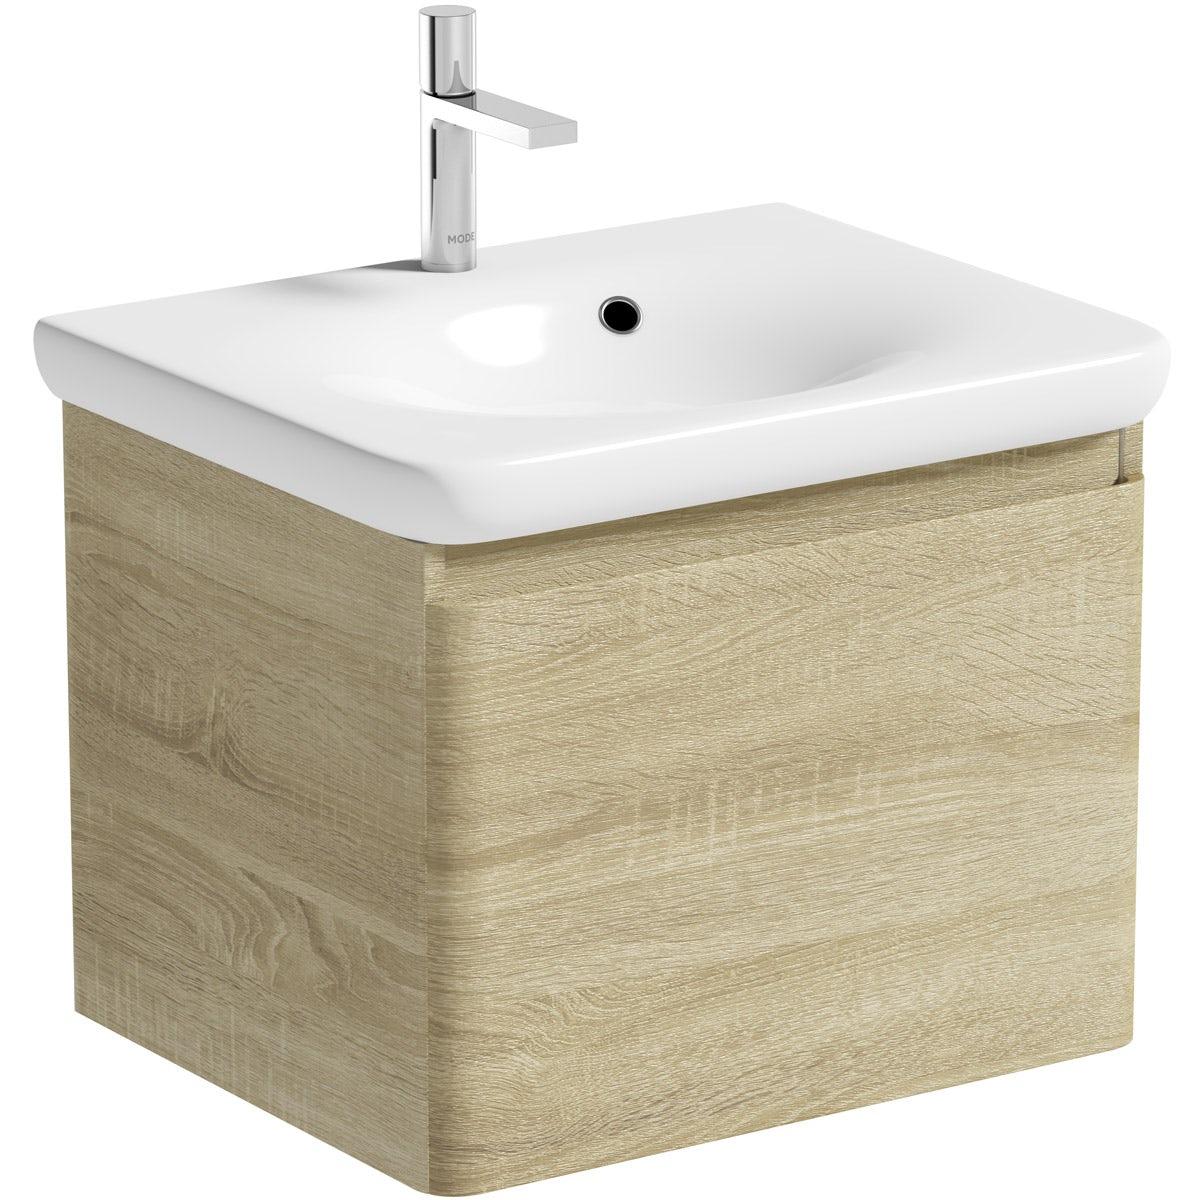 Mode Heath oak wall hung vanity unit and basin 600mm